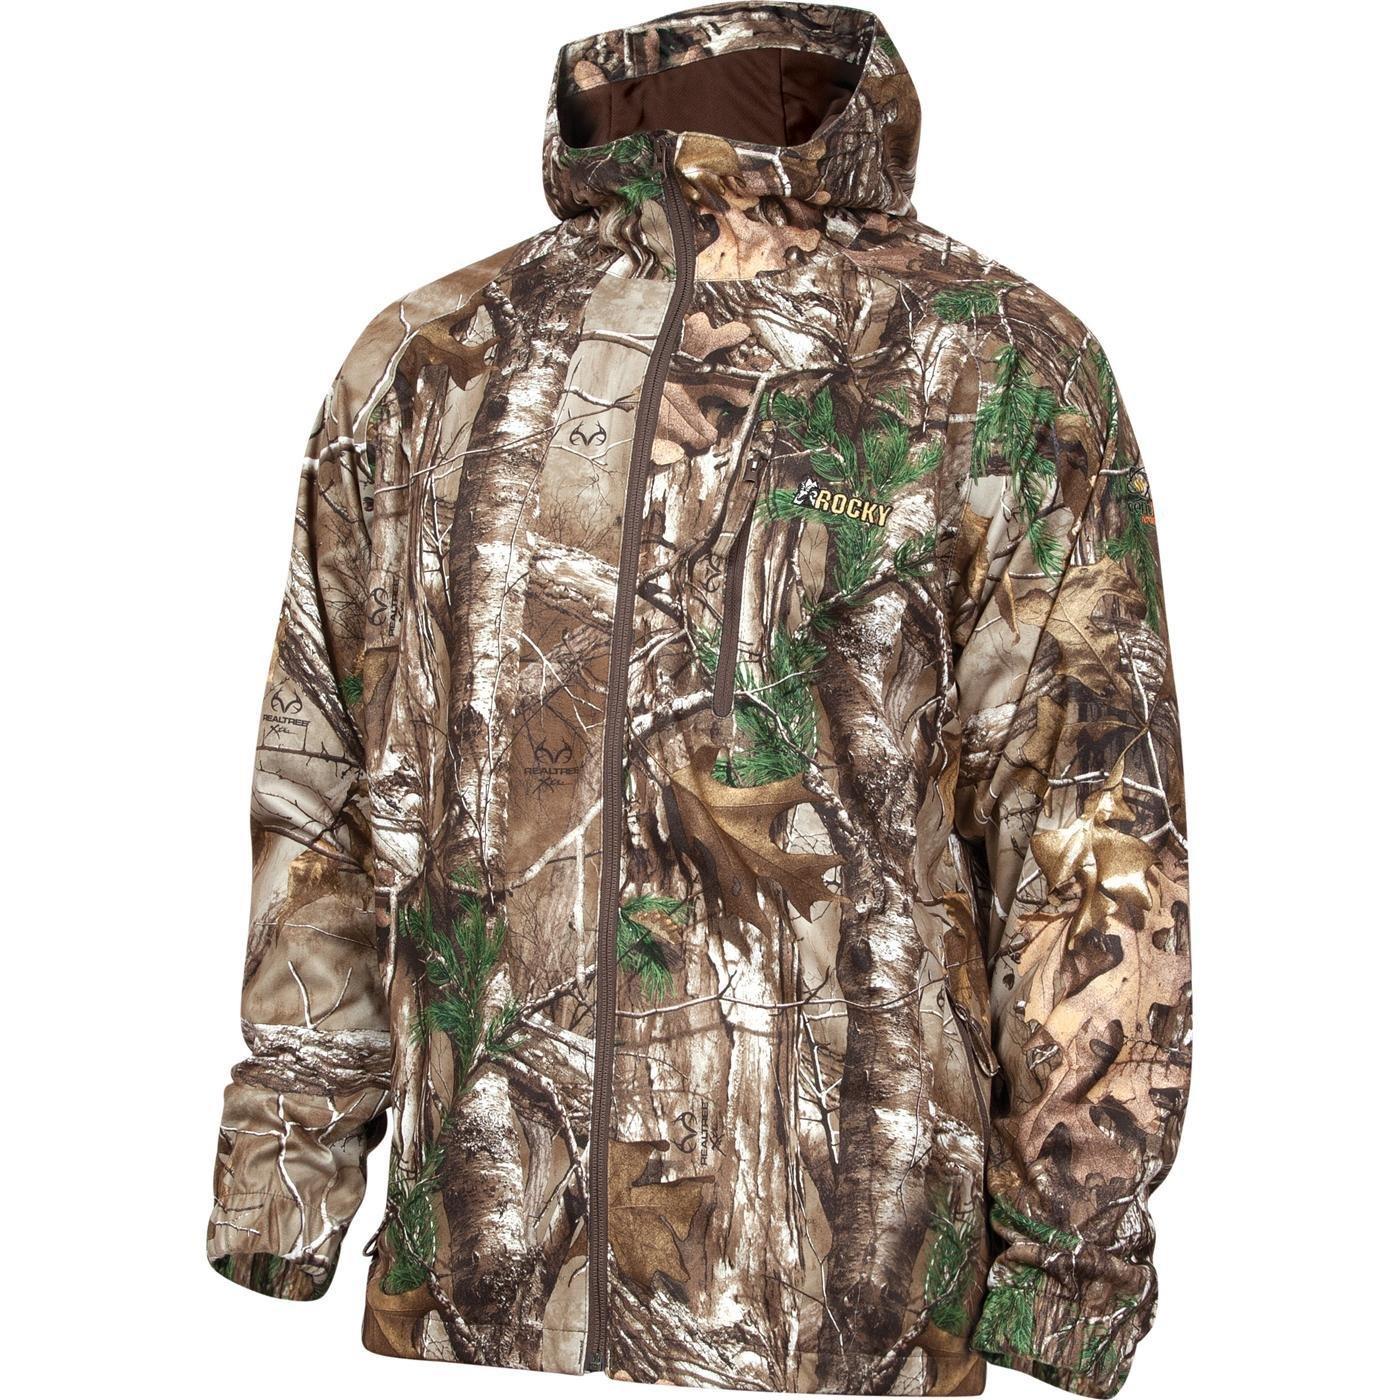 Rocky Men's Silent Hunter Rain Jacket, Camouflage, Large by Rocky